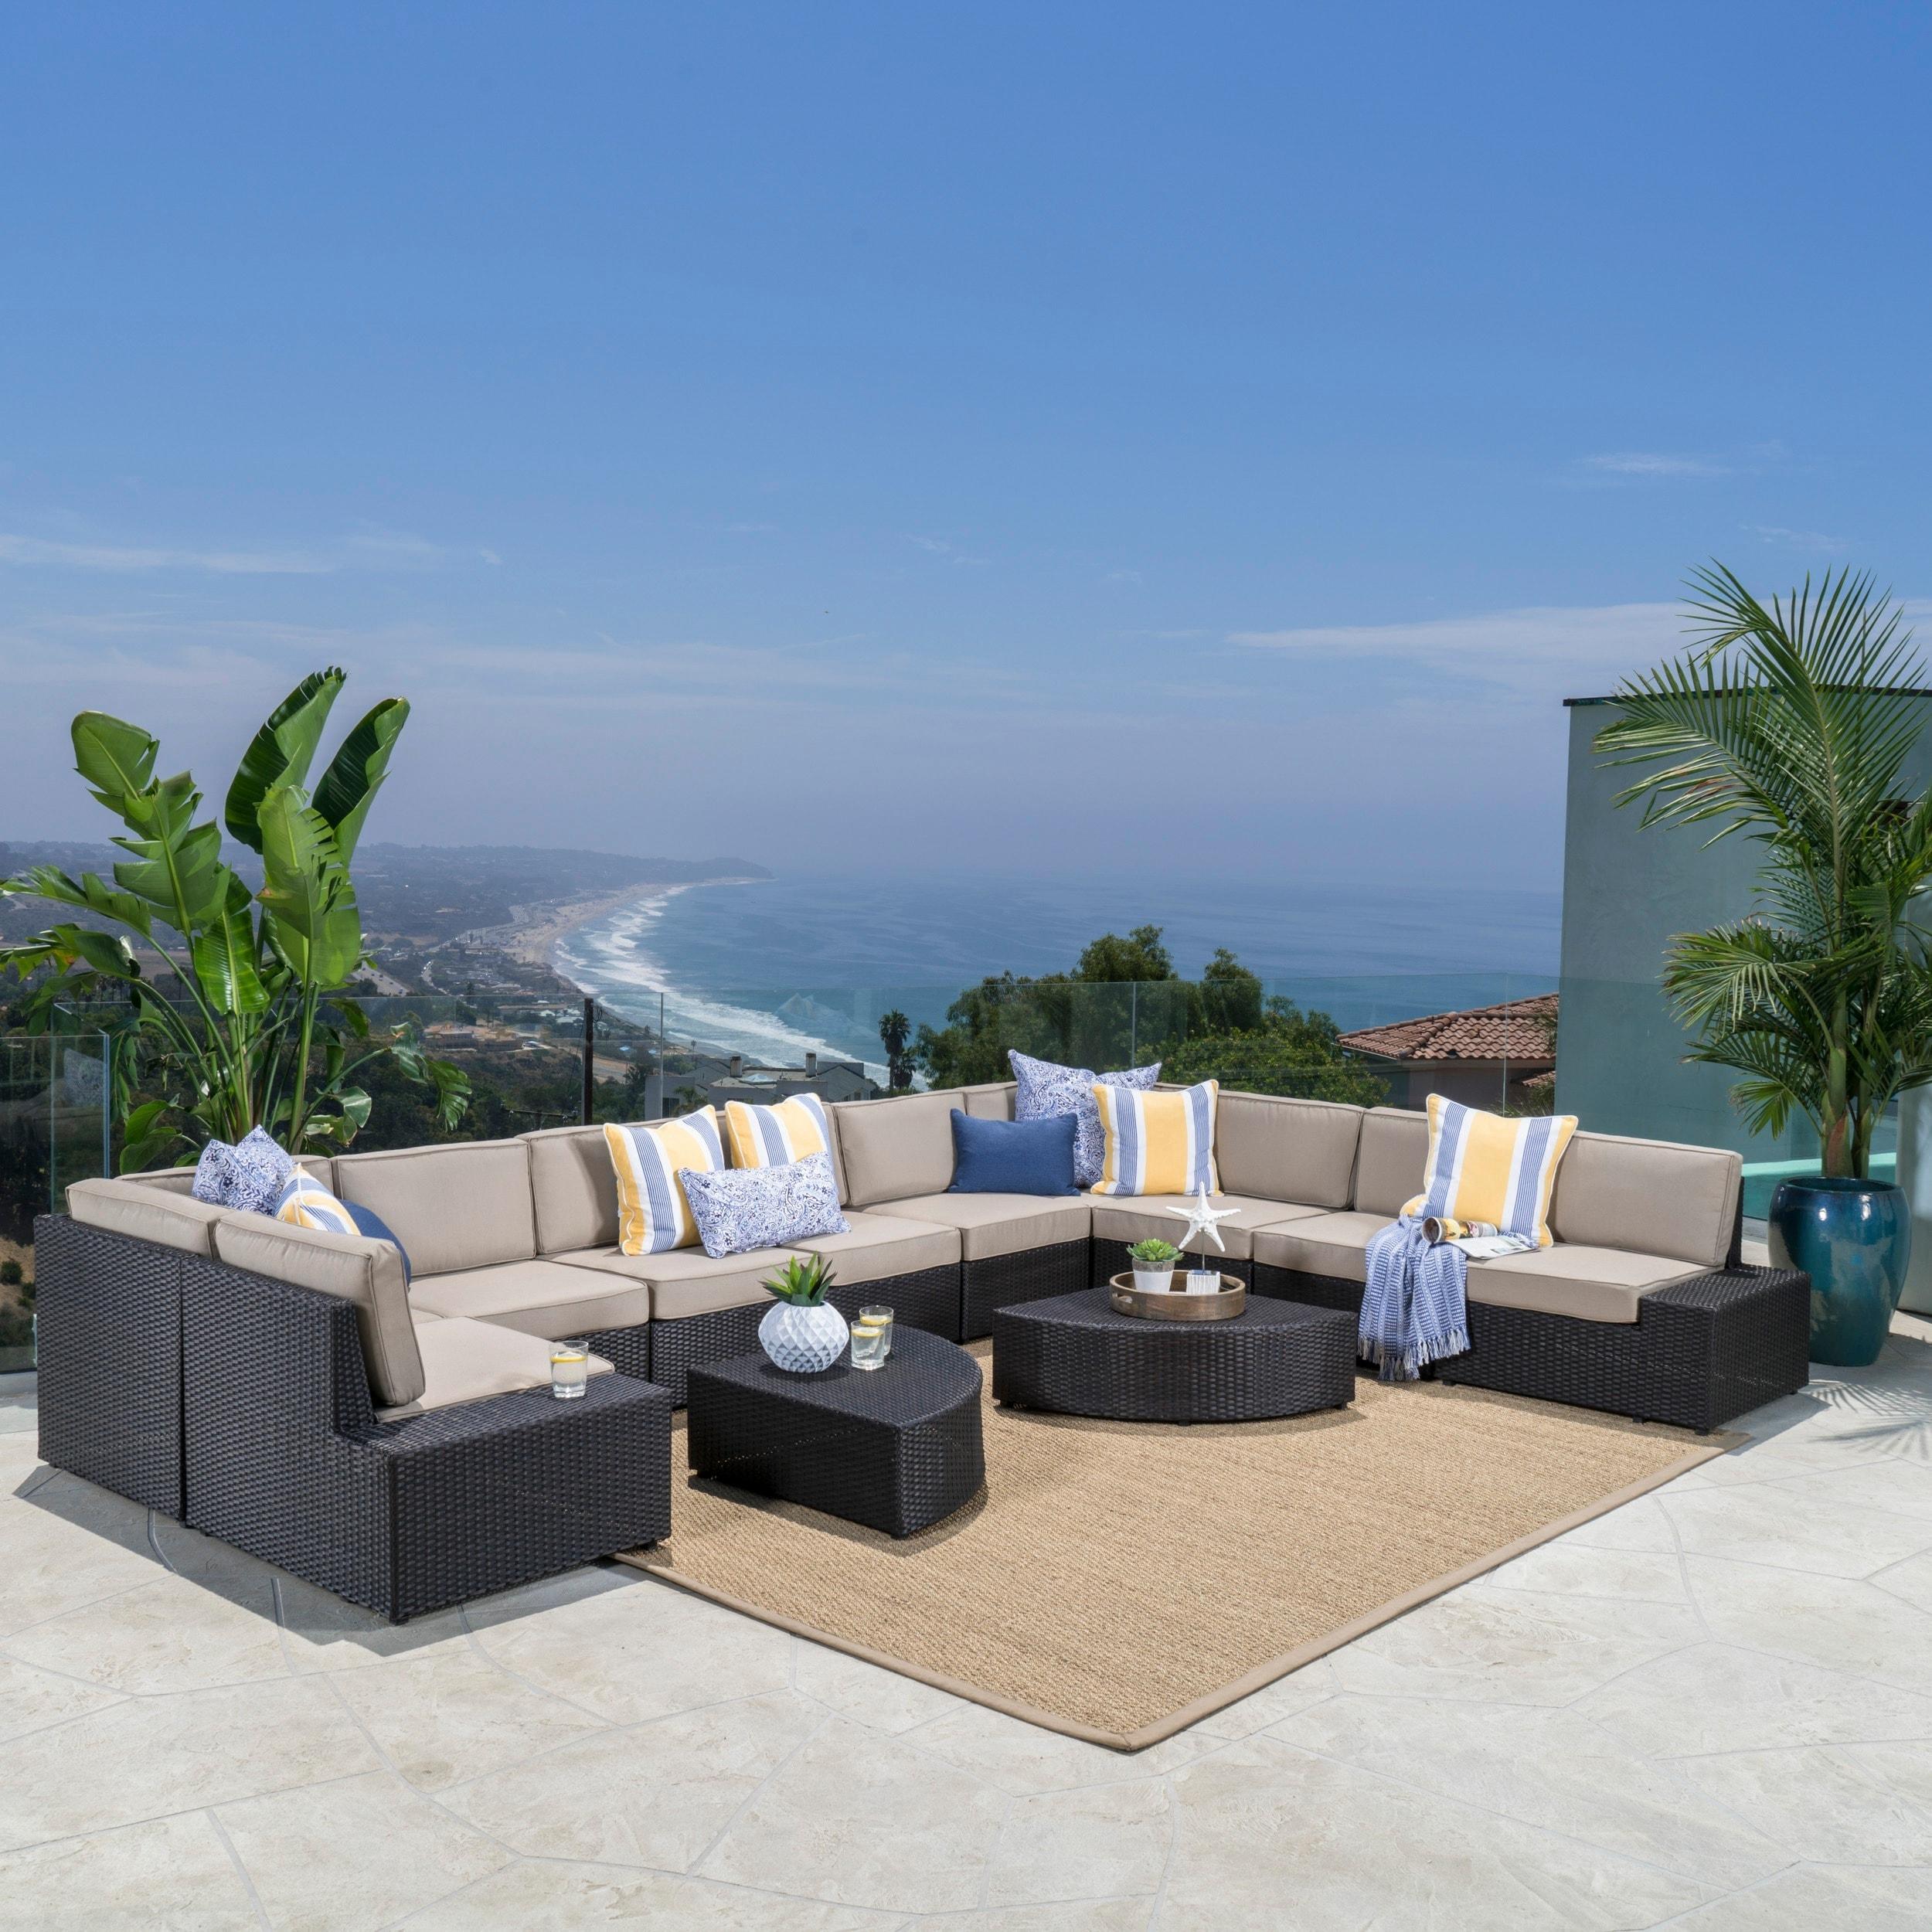 Shop Santa Cruz Outdoor 12-piece Brown Wicker Sofa Set with Cushions ...